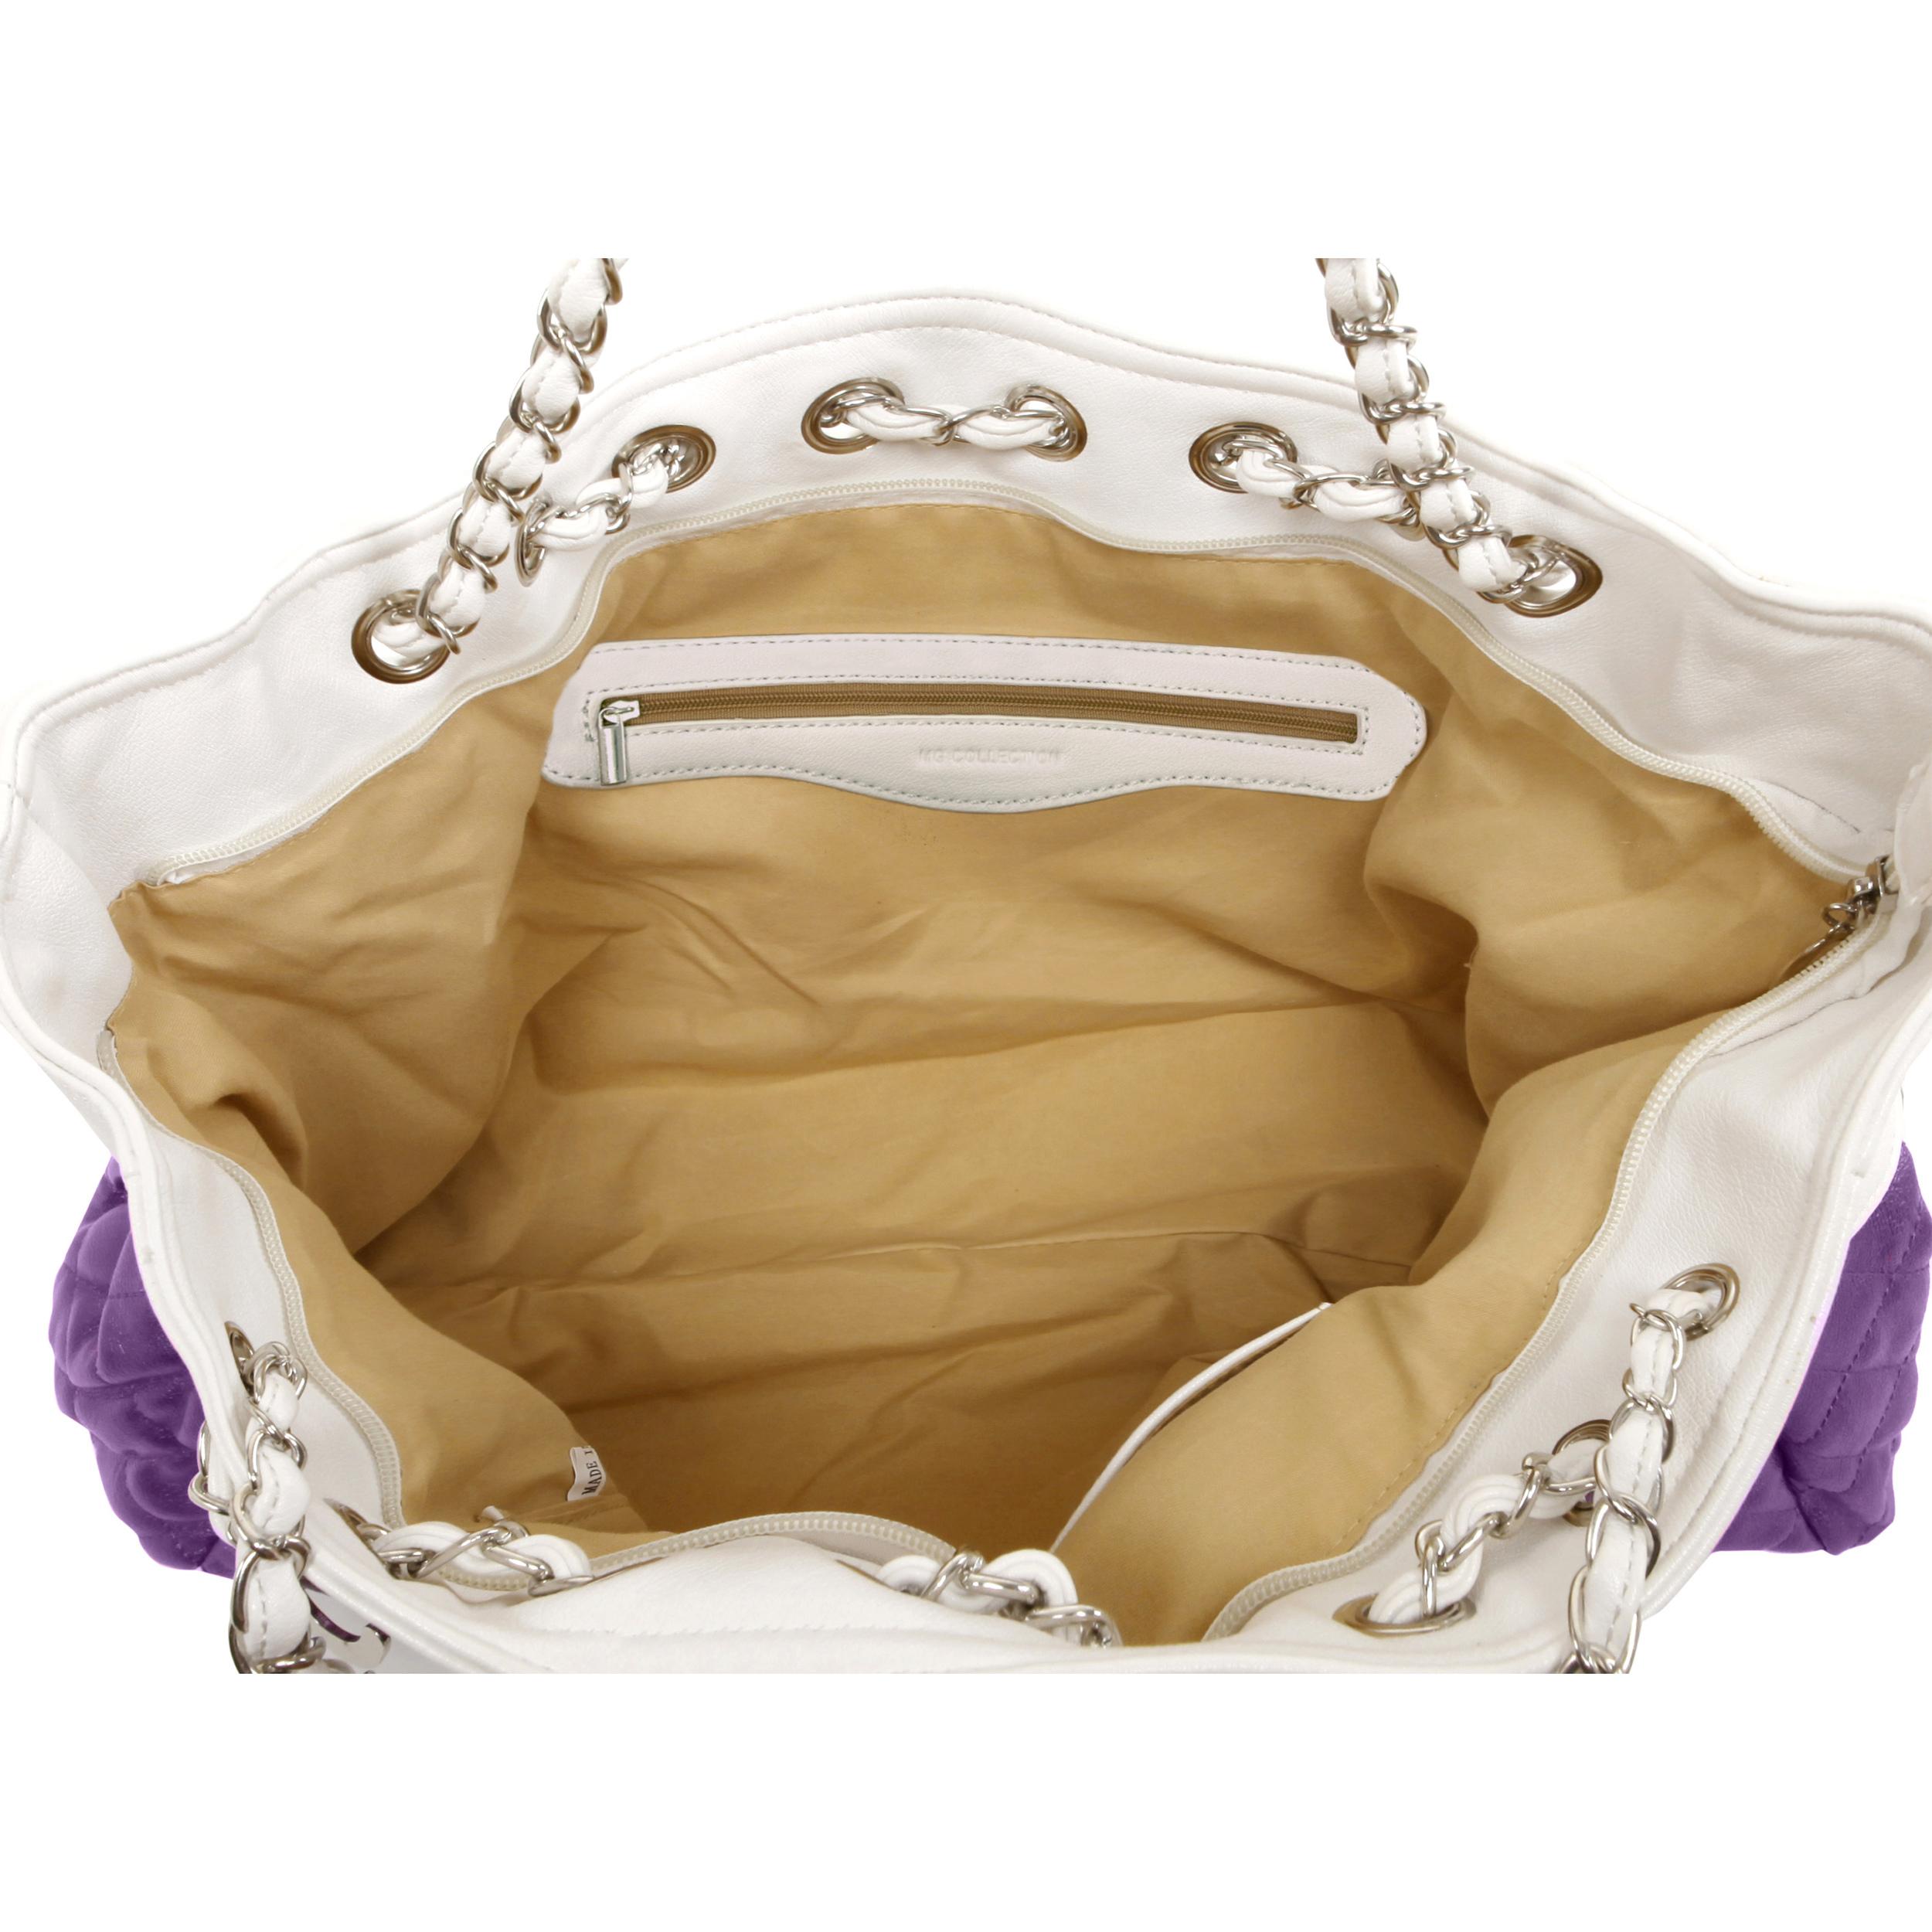 CAMRYN Purple Shoulder Weekender Tote handbag interior